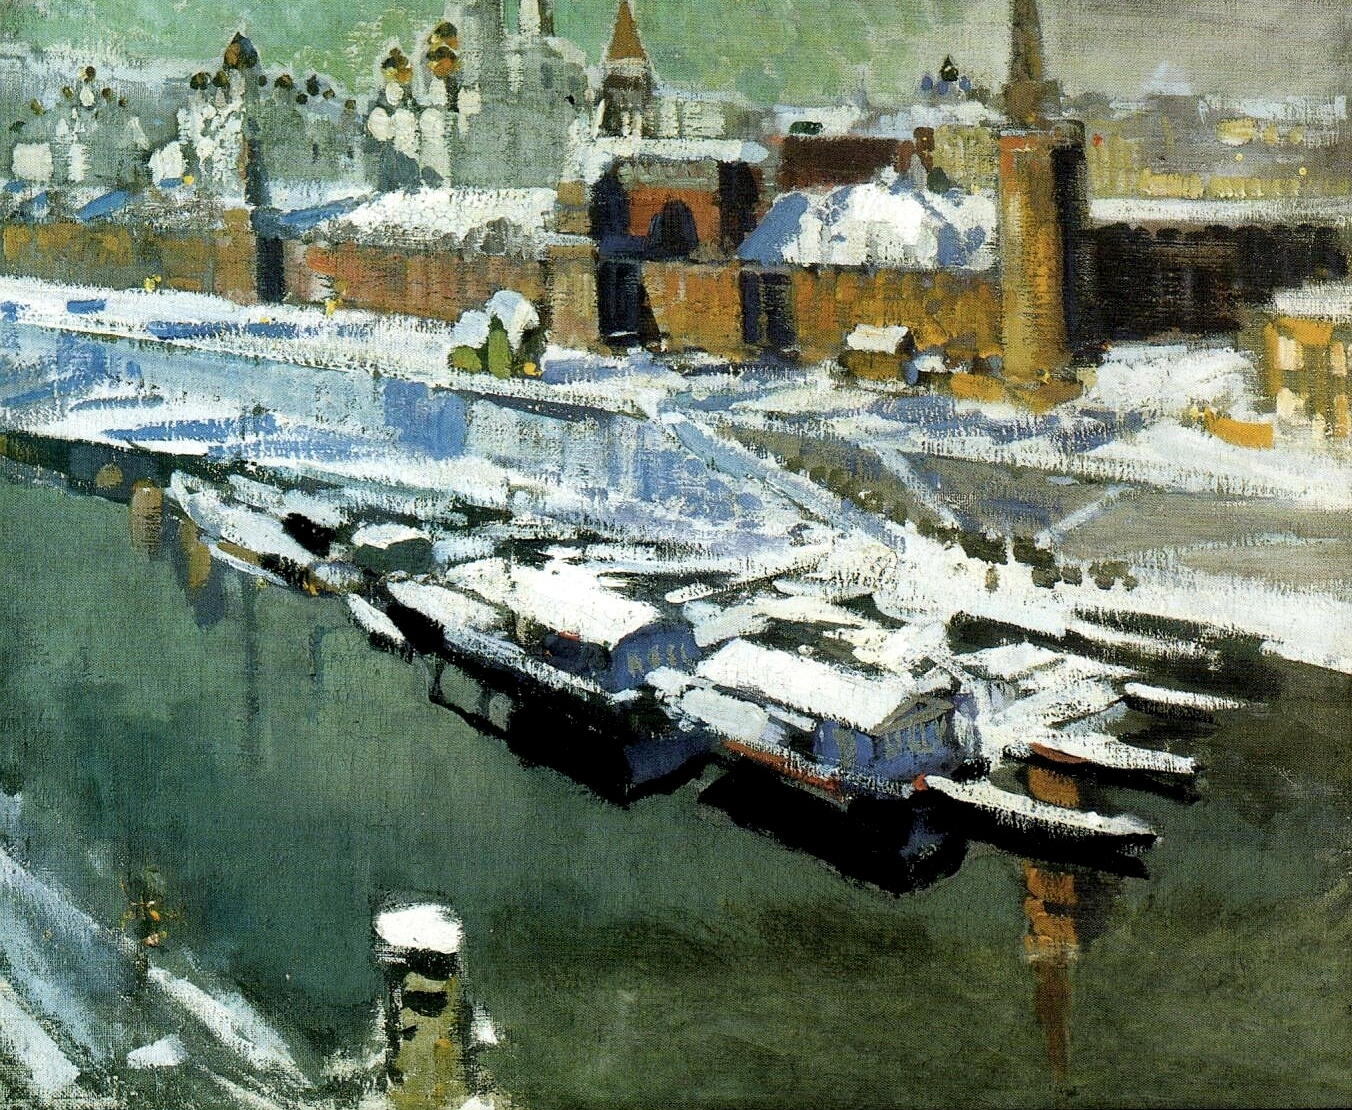 The Kremlin Under Snow, c. 1910 - Konstantin Korovin